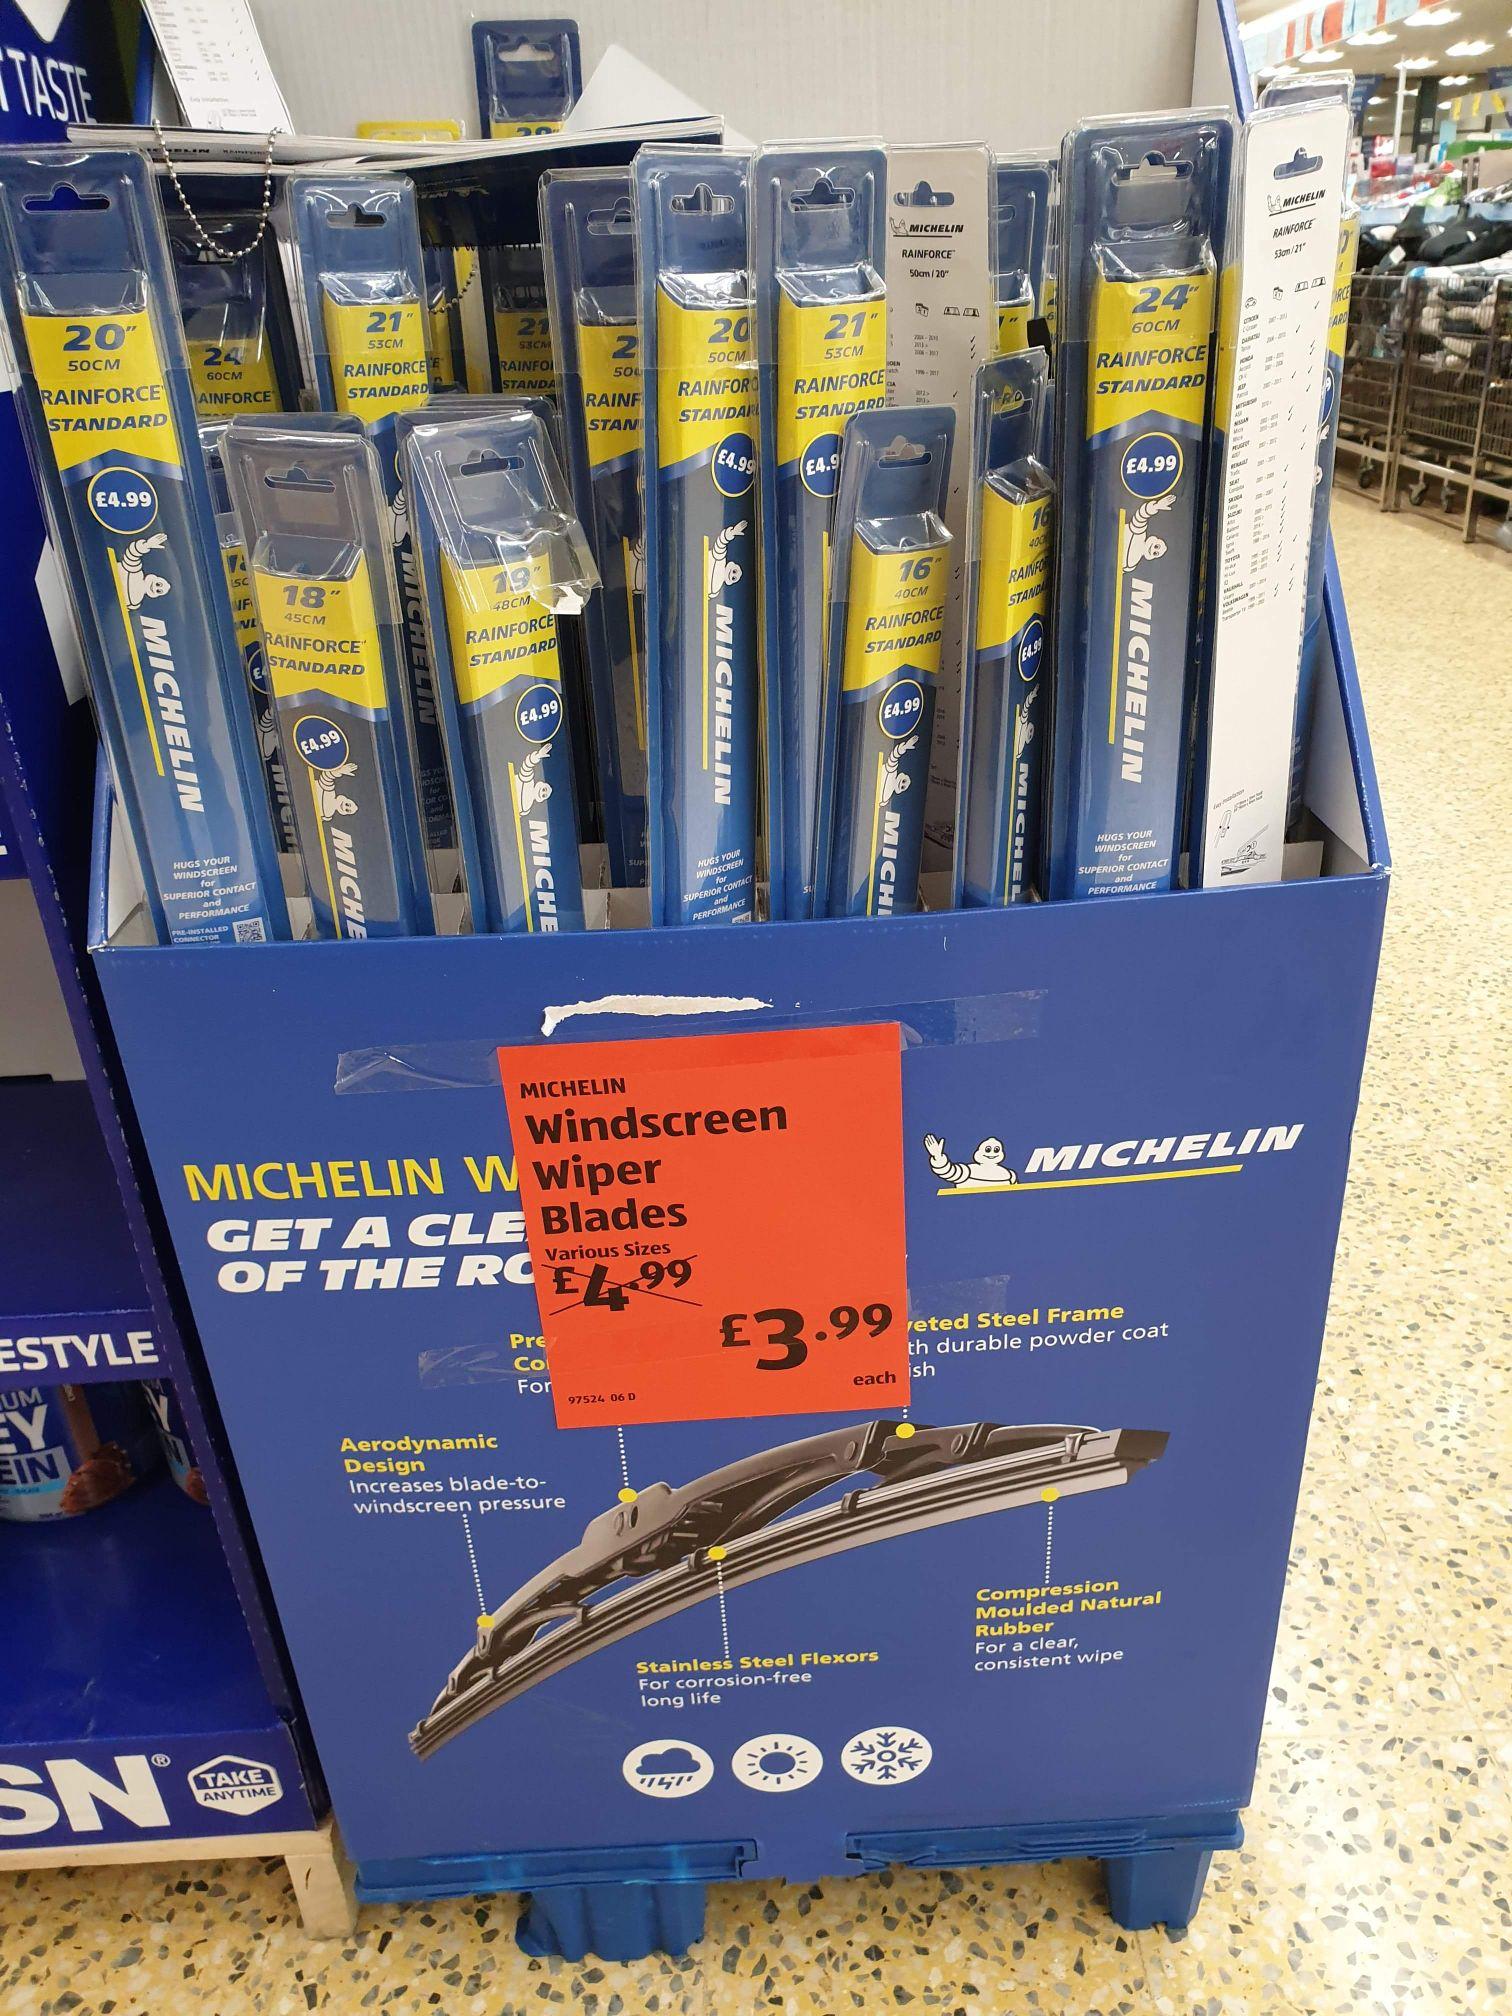 Michelin Rainforce standard Wiper Blades - various sizes In-store @ Aldi - £3.99